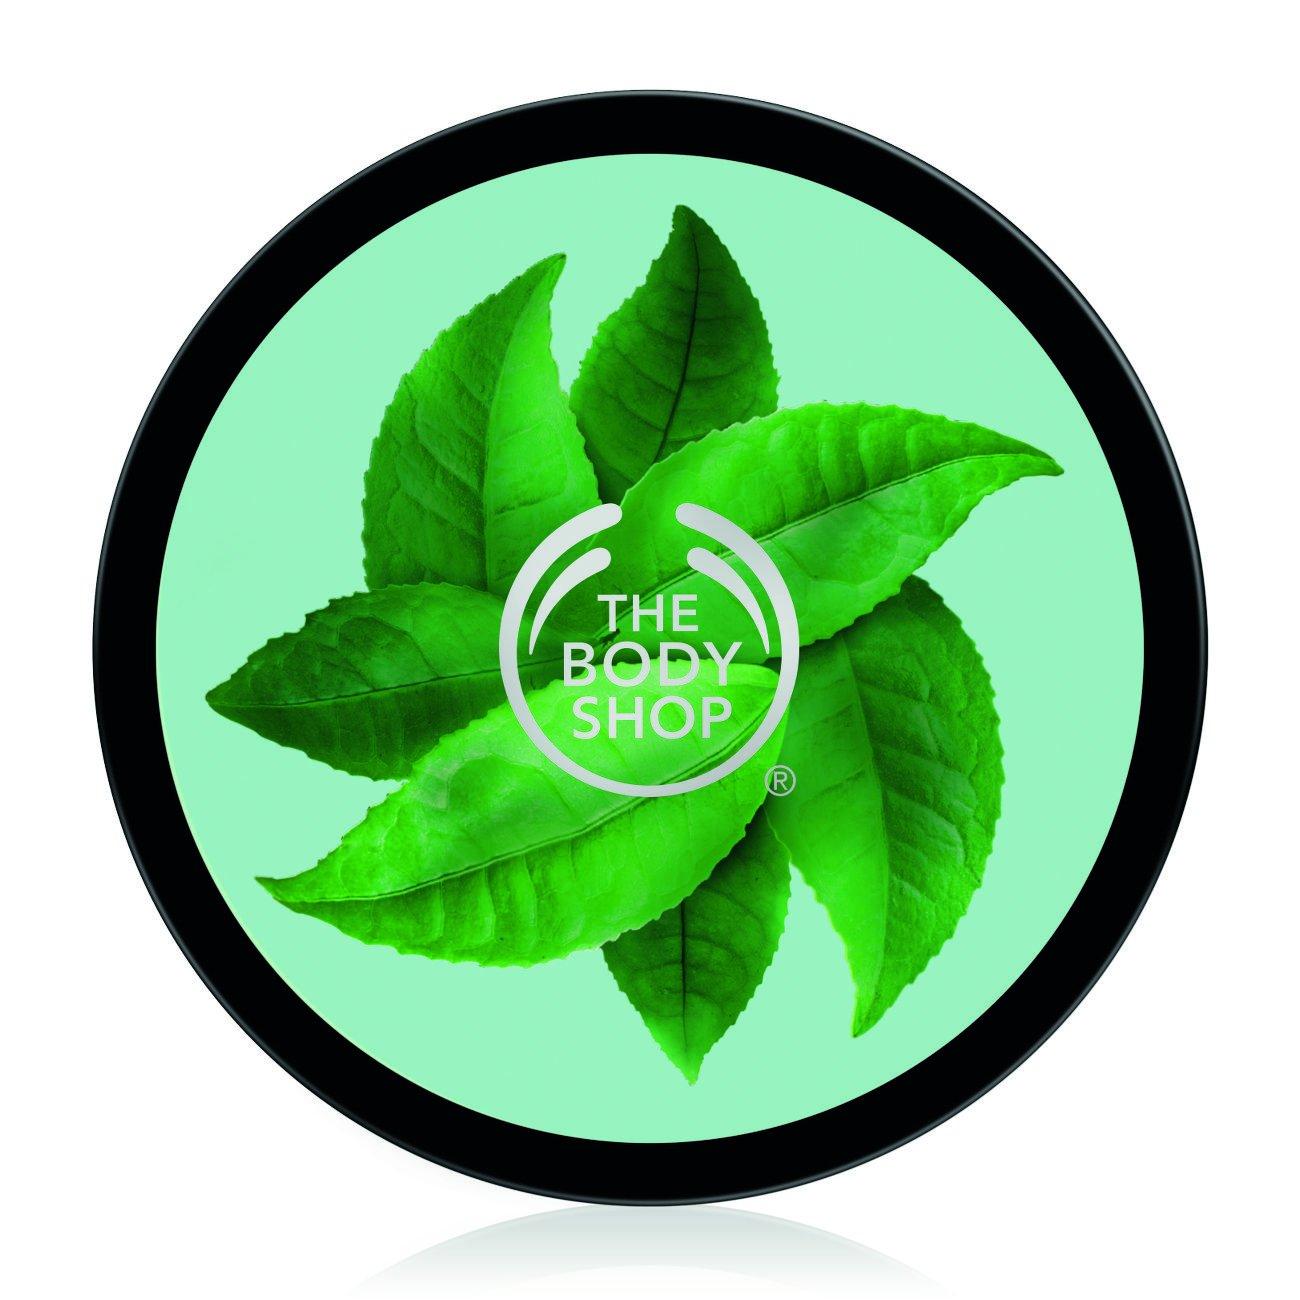 The Body Shop Fuji Green Tea Exfoliating Soap, 100g The Body Shop Canada